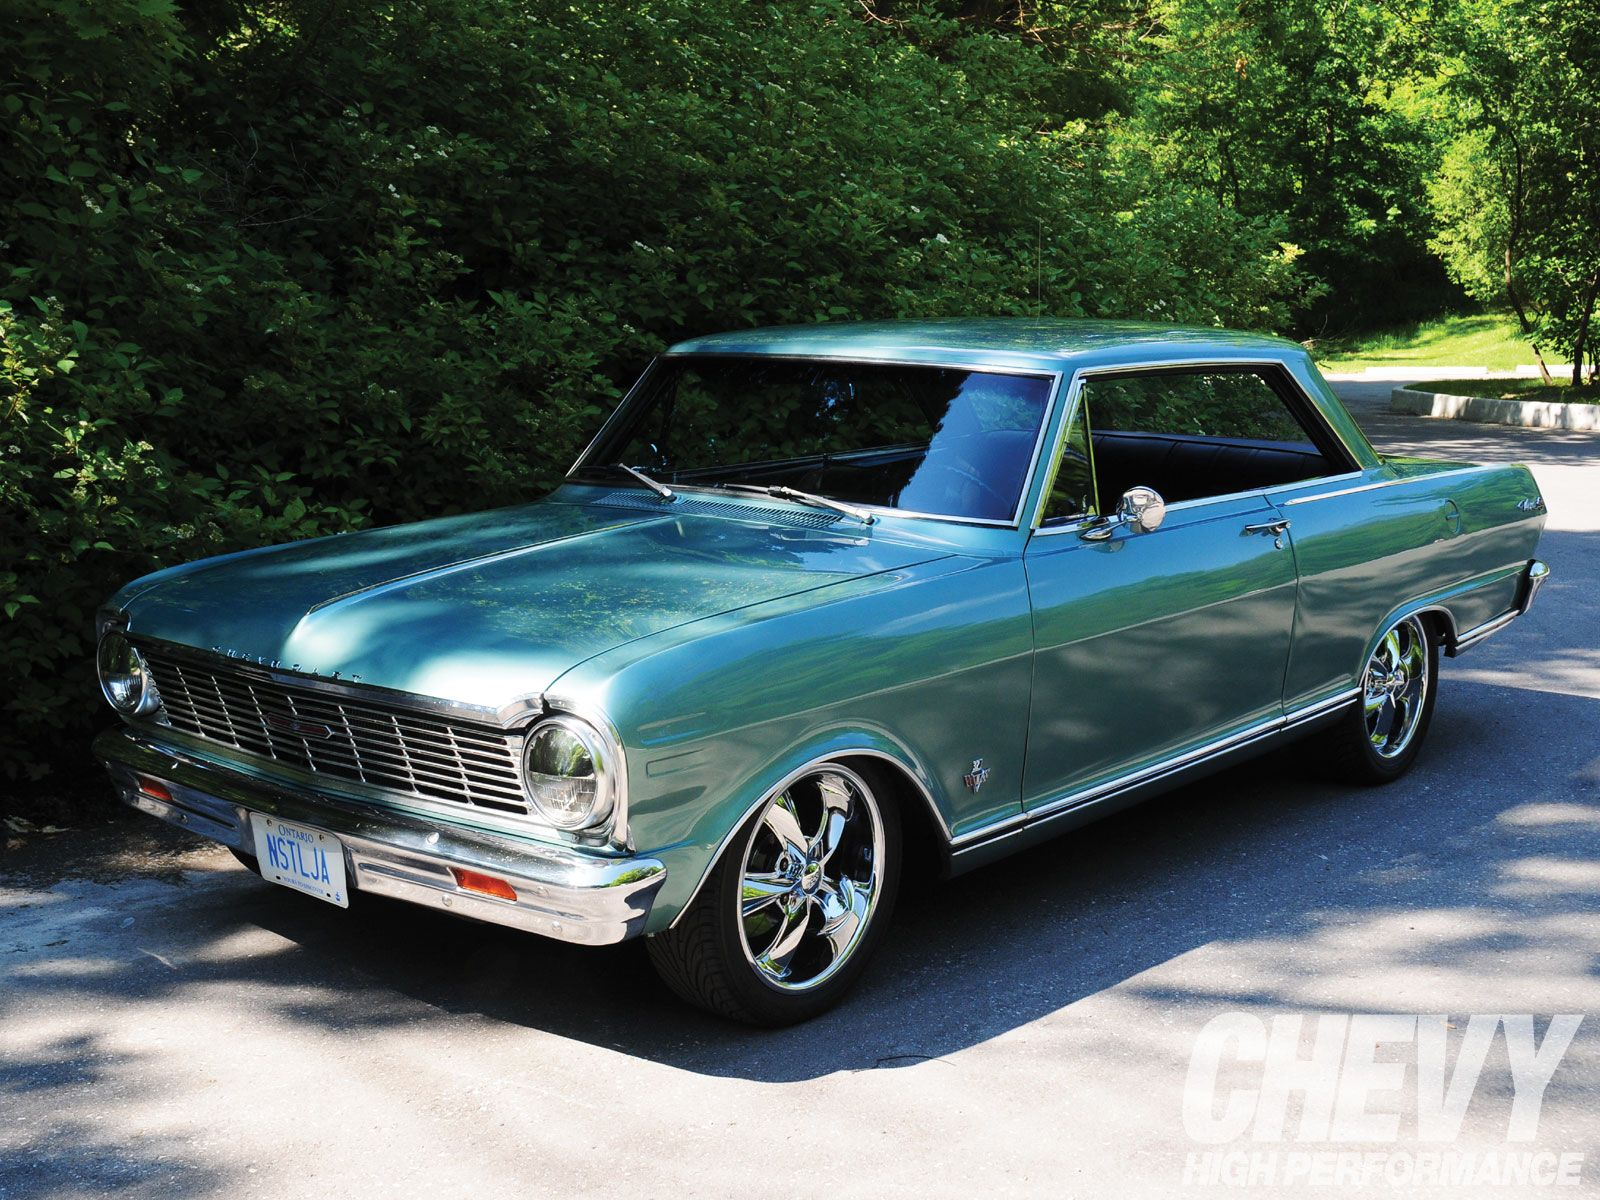 1965 chevy ii nova ss favorite cars american muscle pinterest - Chevy Nova 1965 Chevy Nova Front Grill